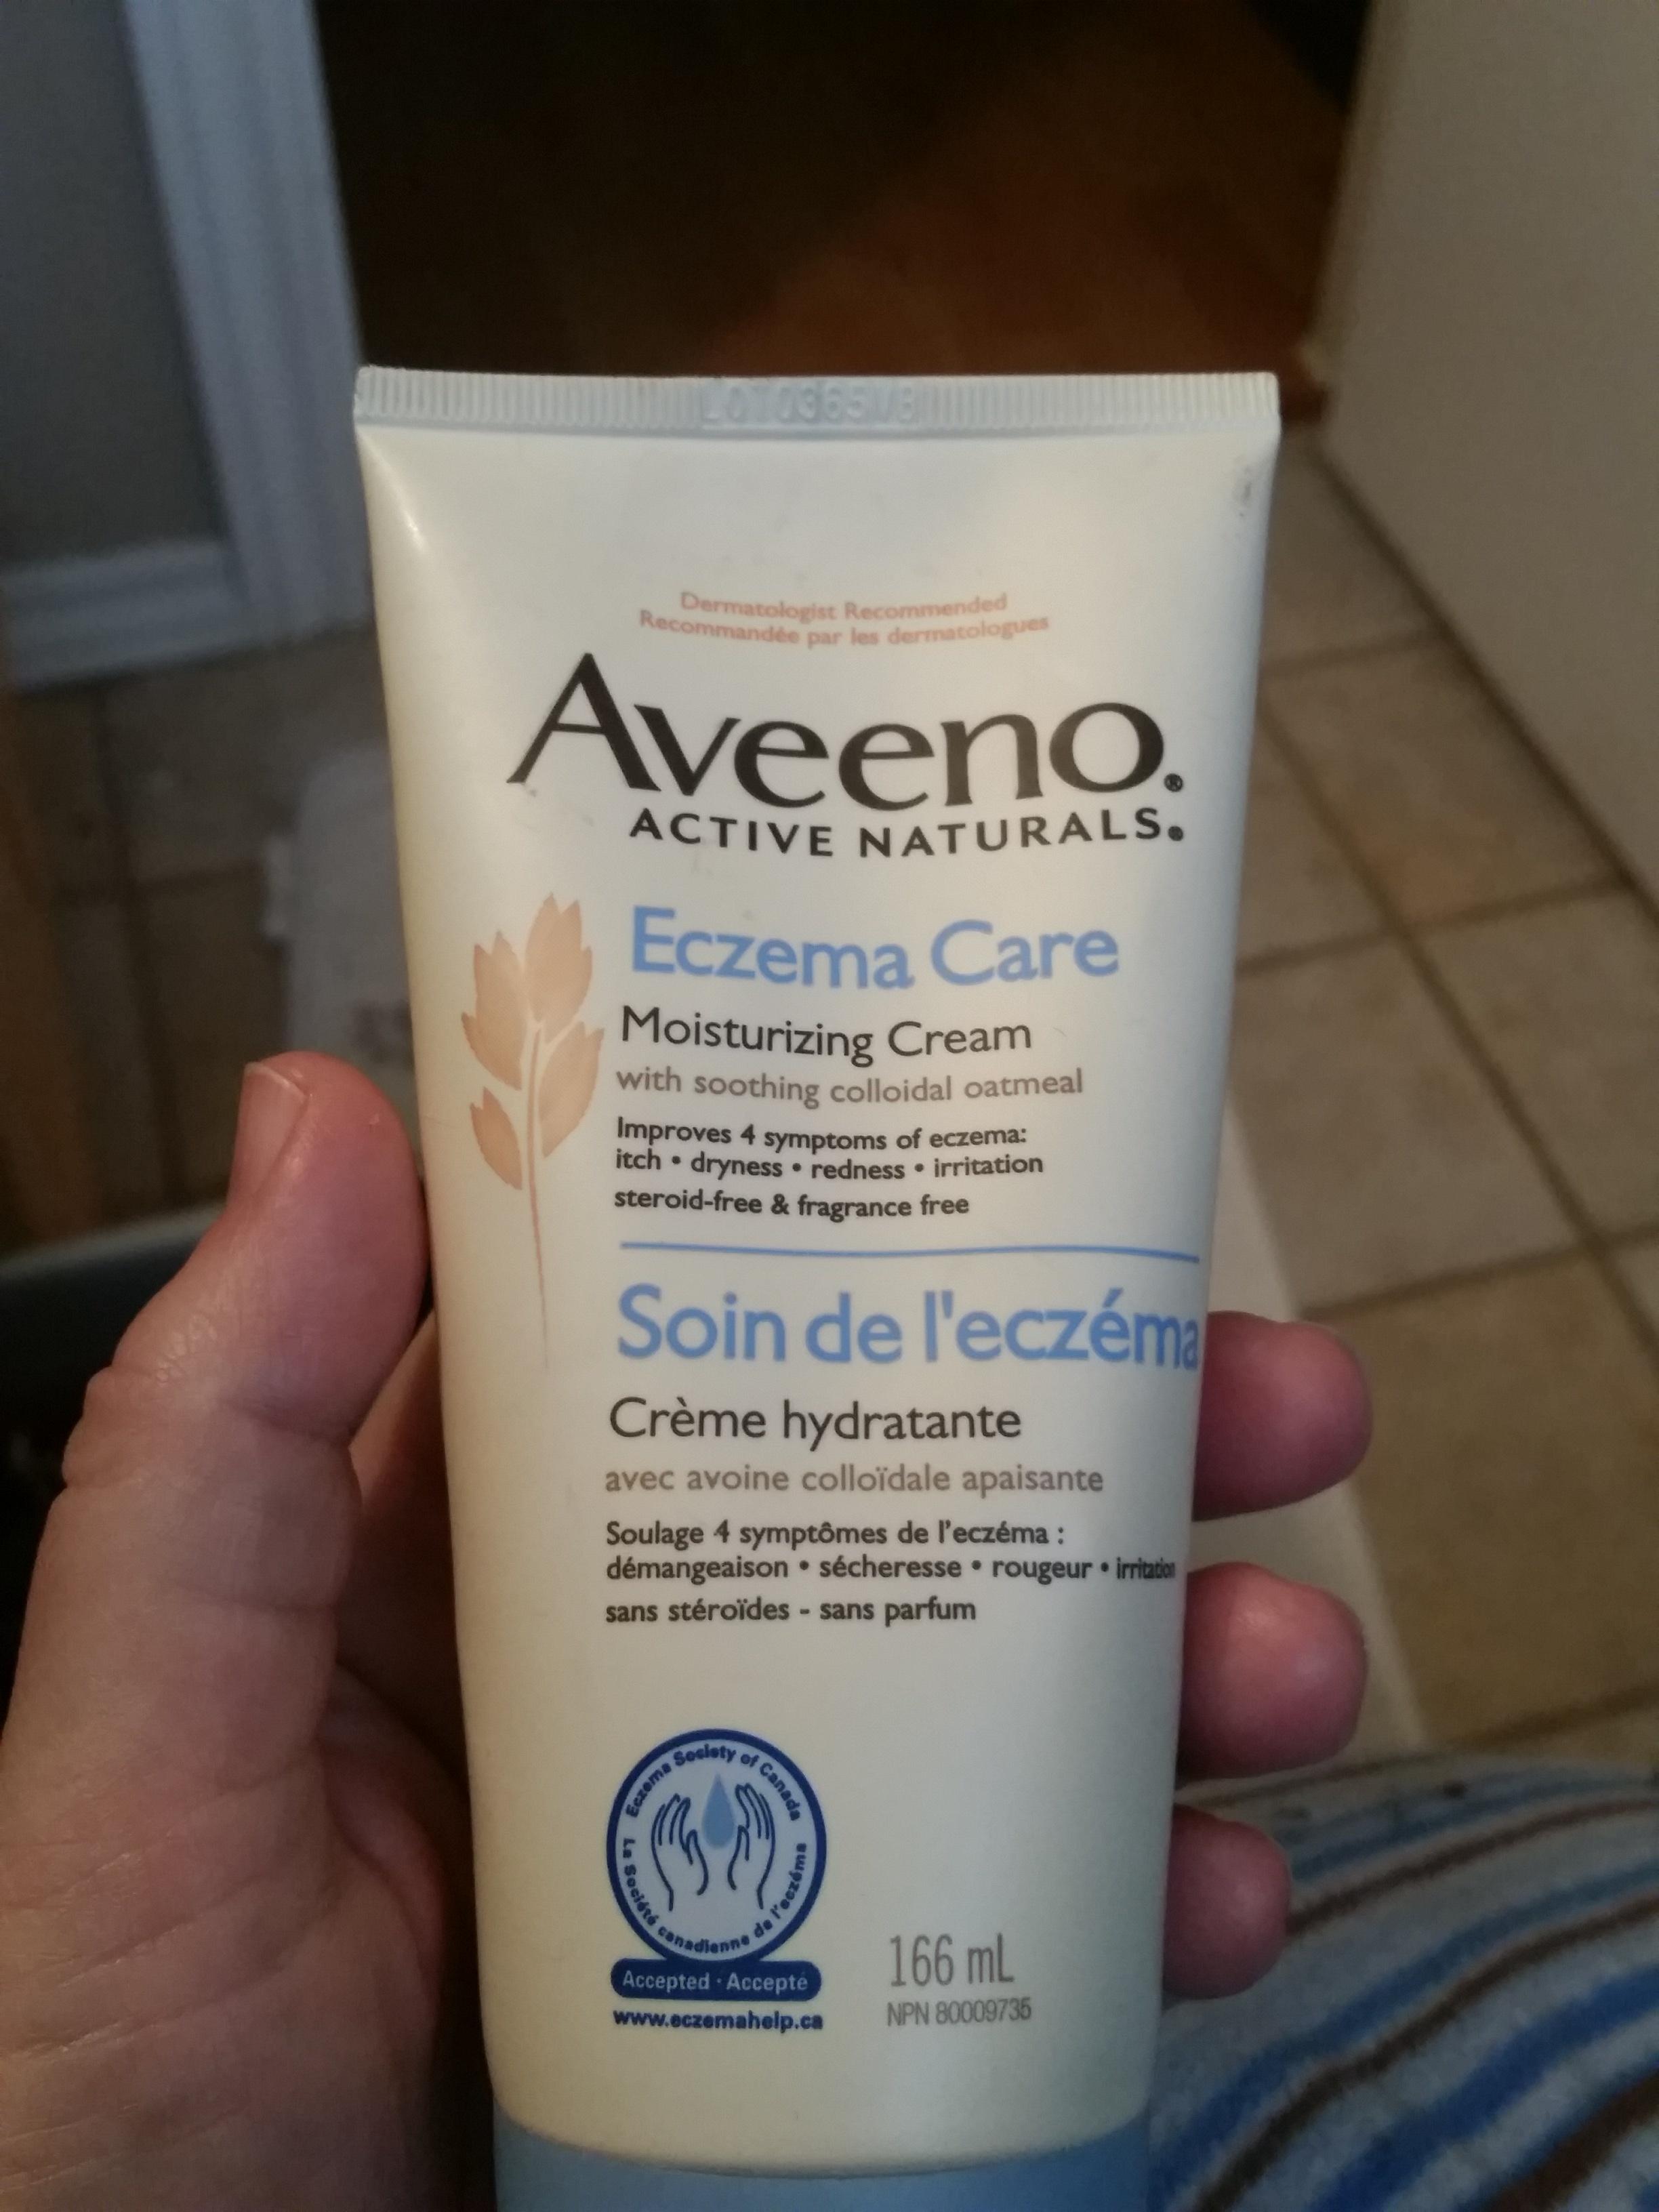 aveeno advanced care moisturizing cream